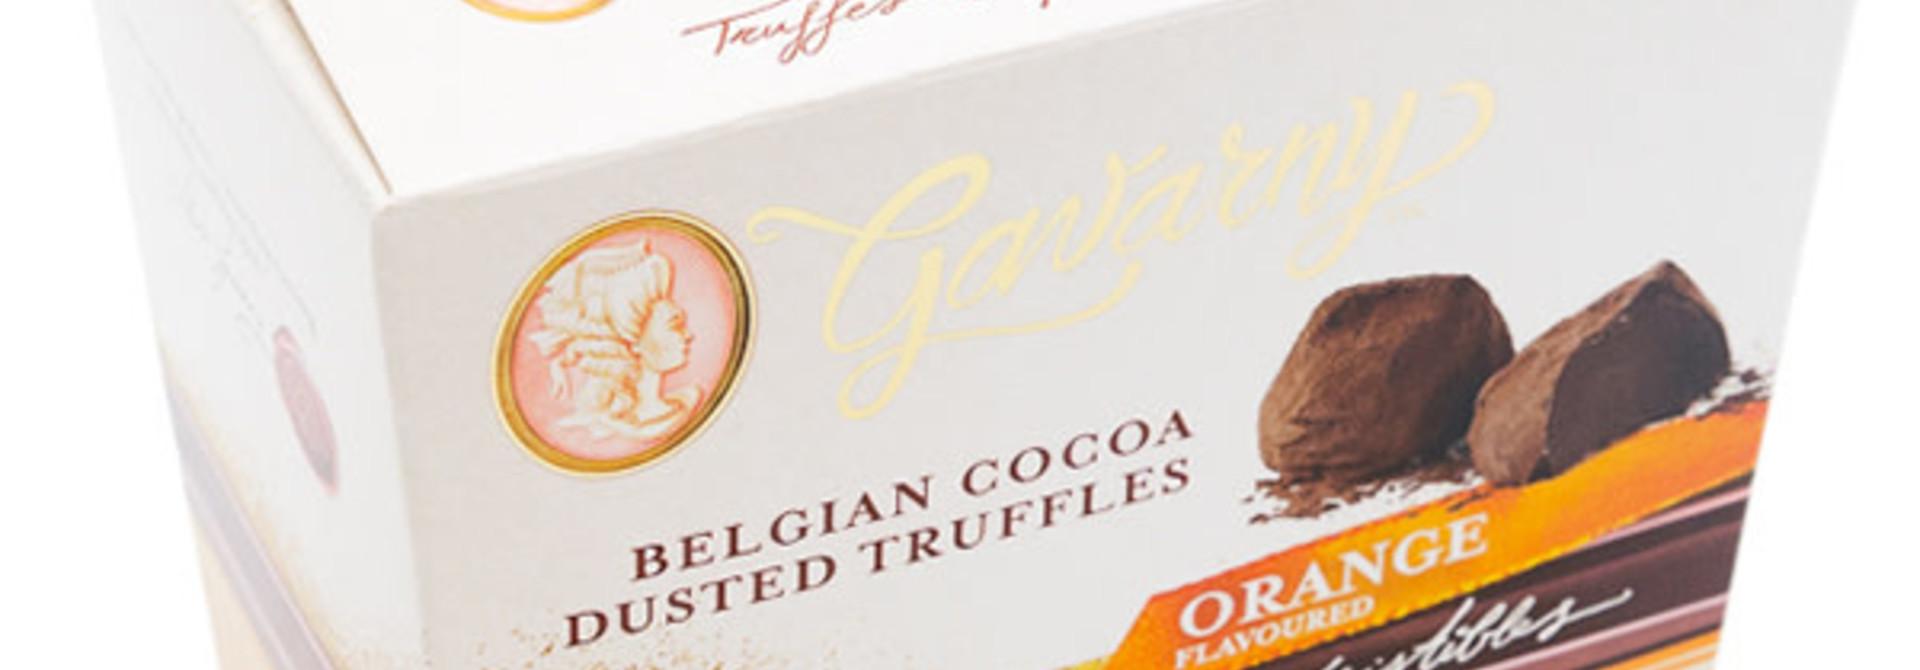 Belgian cocoa dusted truffles (orange)